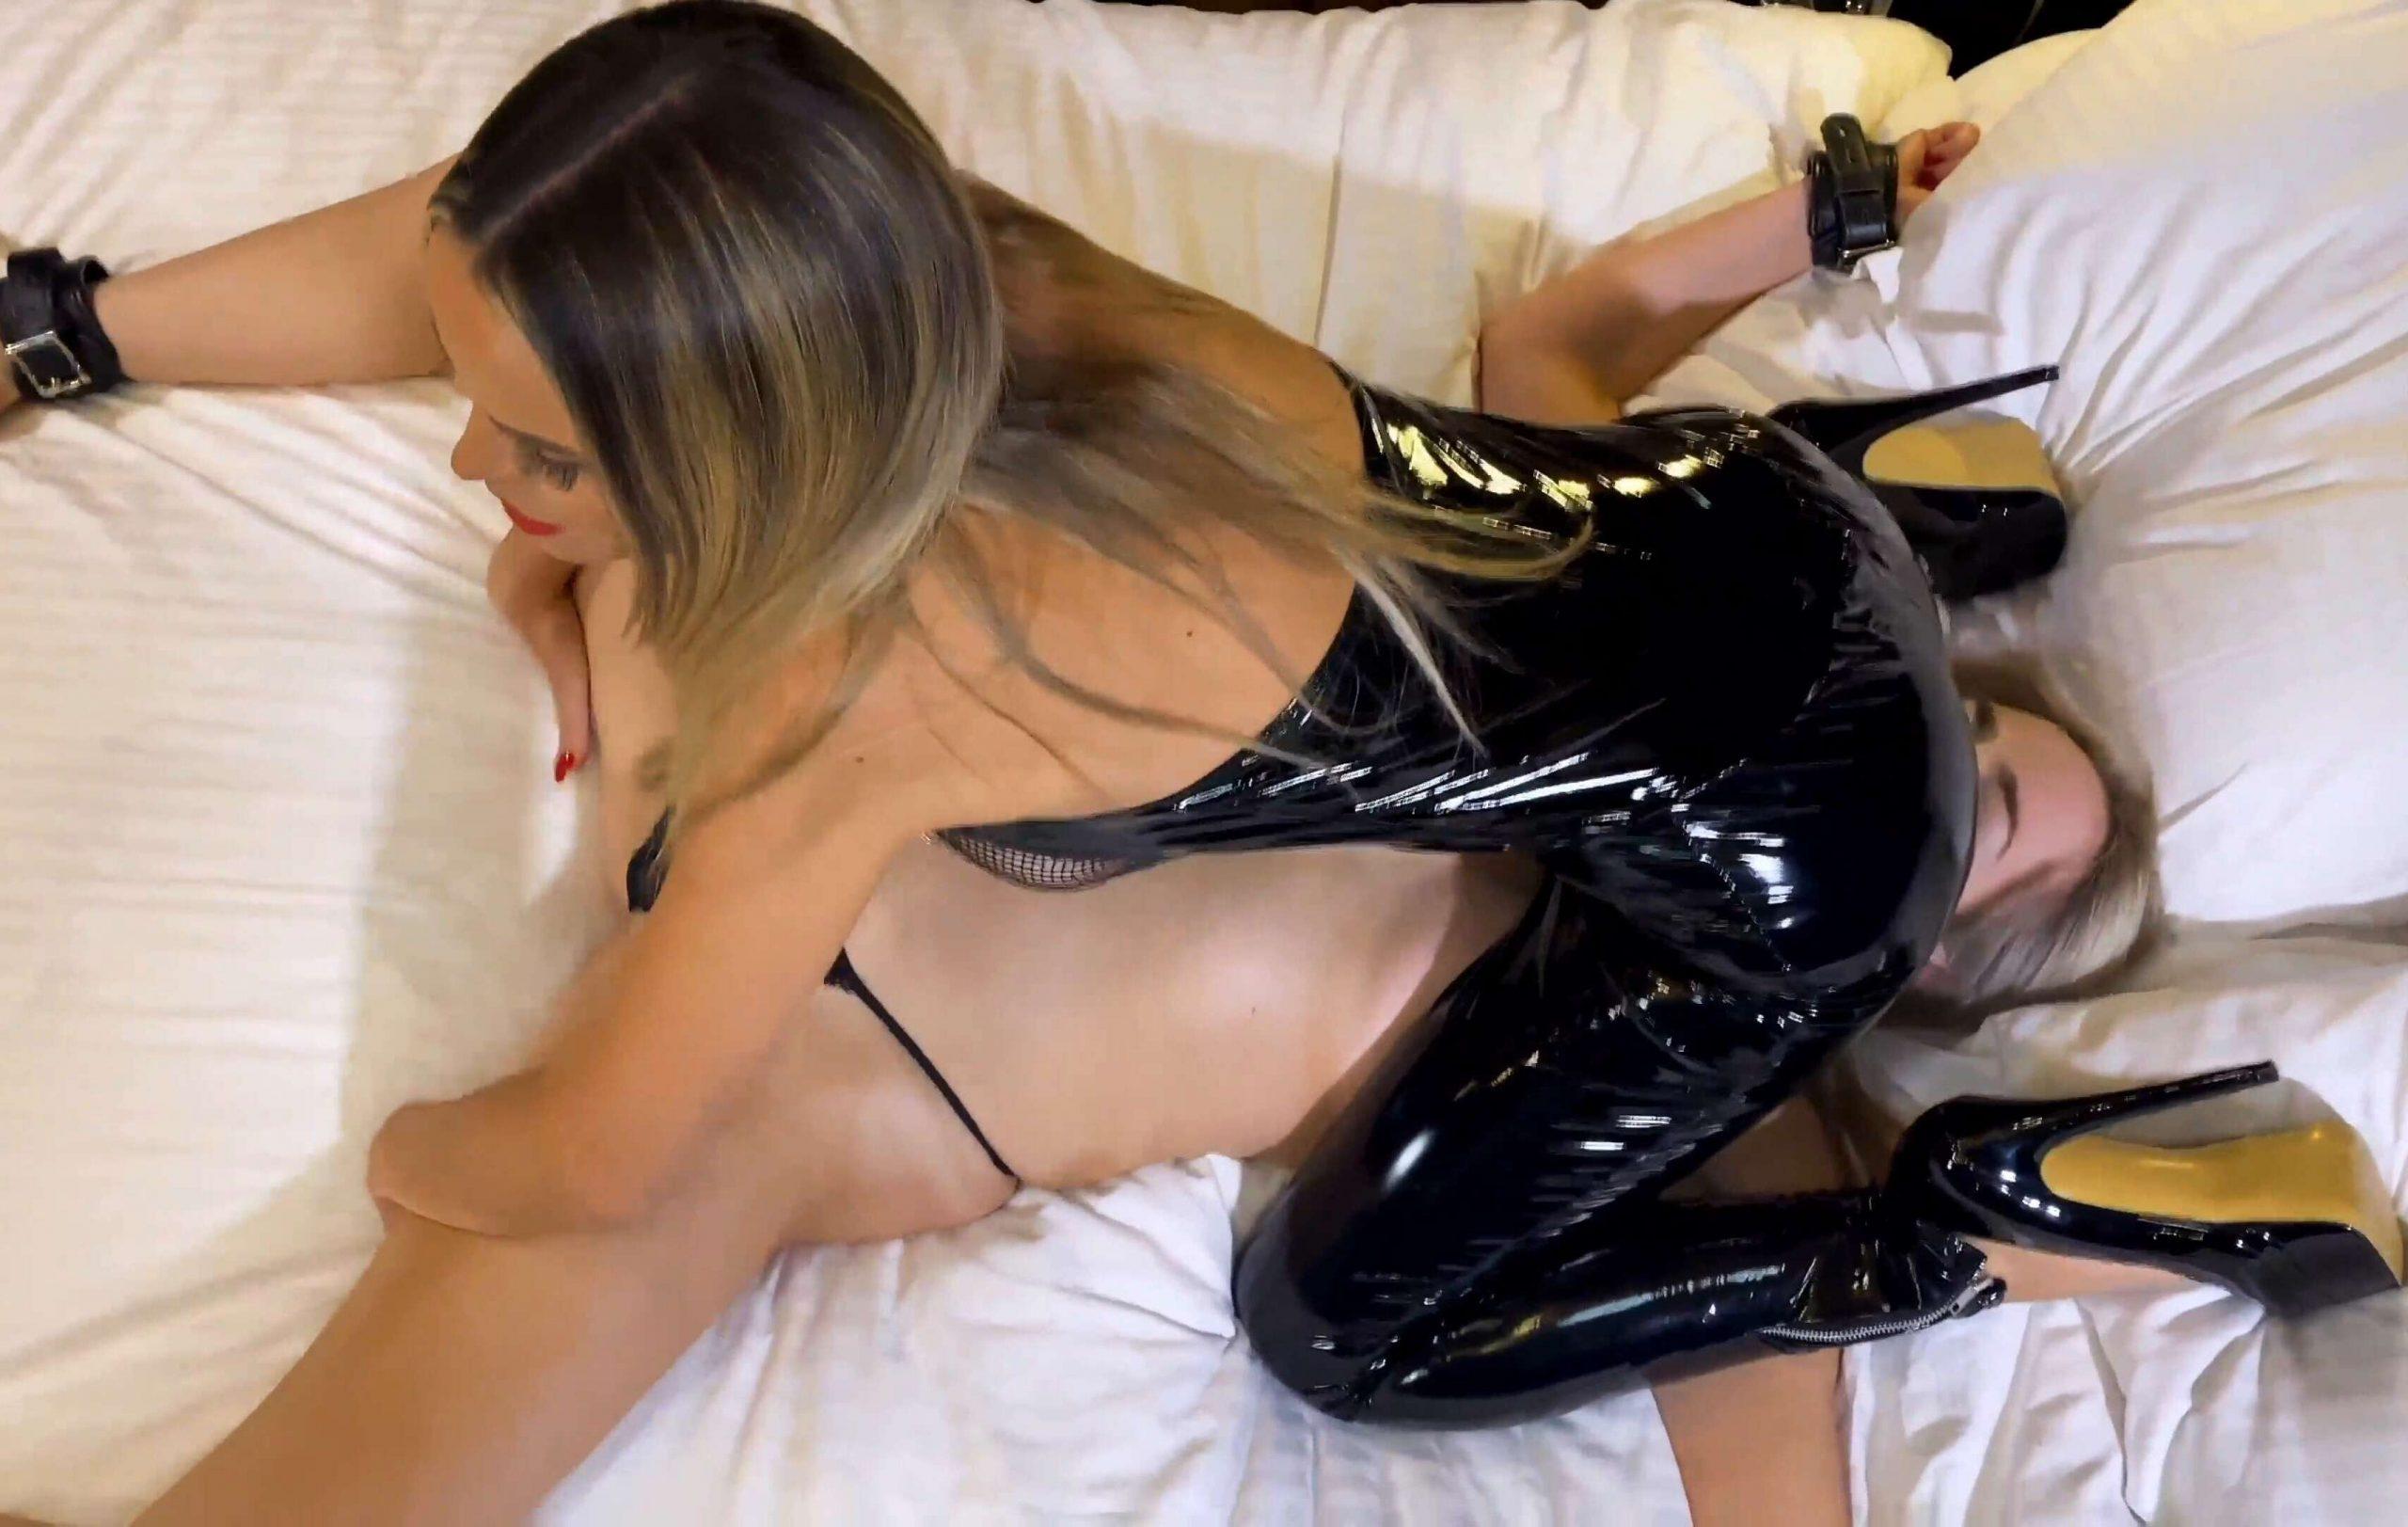 Lesbian Bondage - Arabella Jade and Jasmine Sinclair – Killer Pants! - Boundhoneys - Arabella to ORGASM and uses Arabella as a sex toy